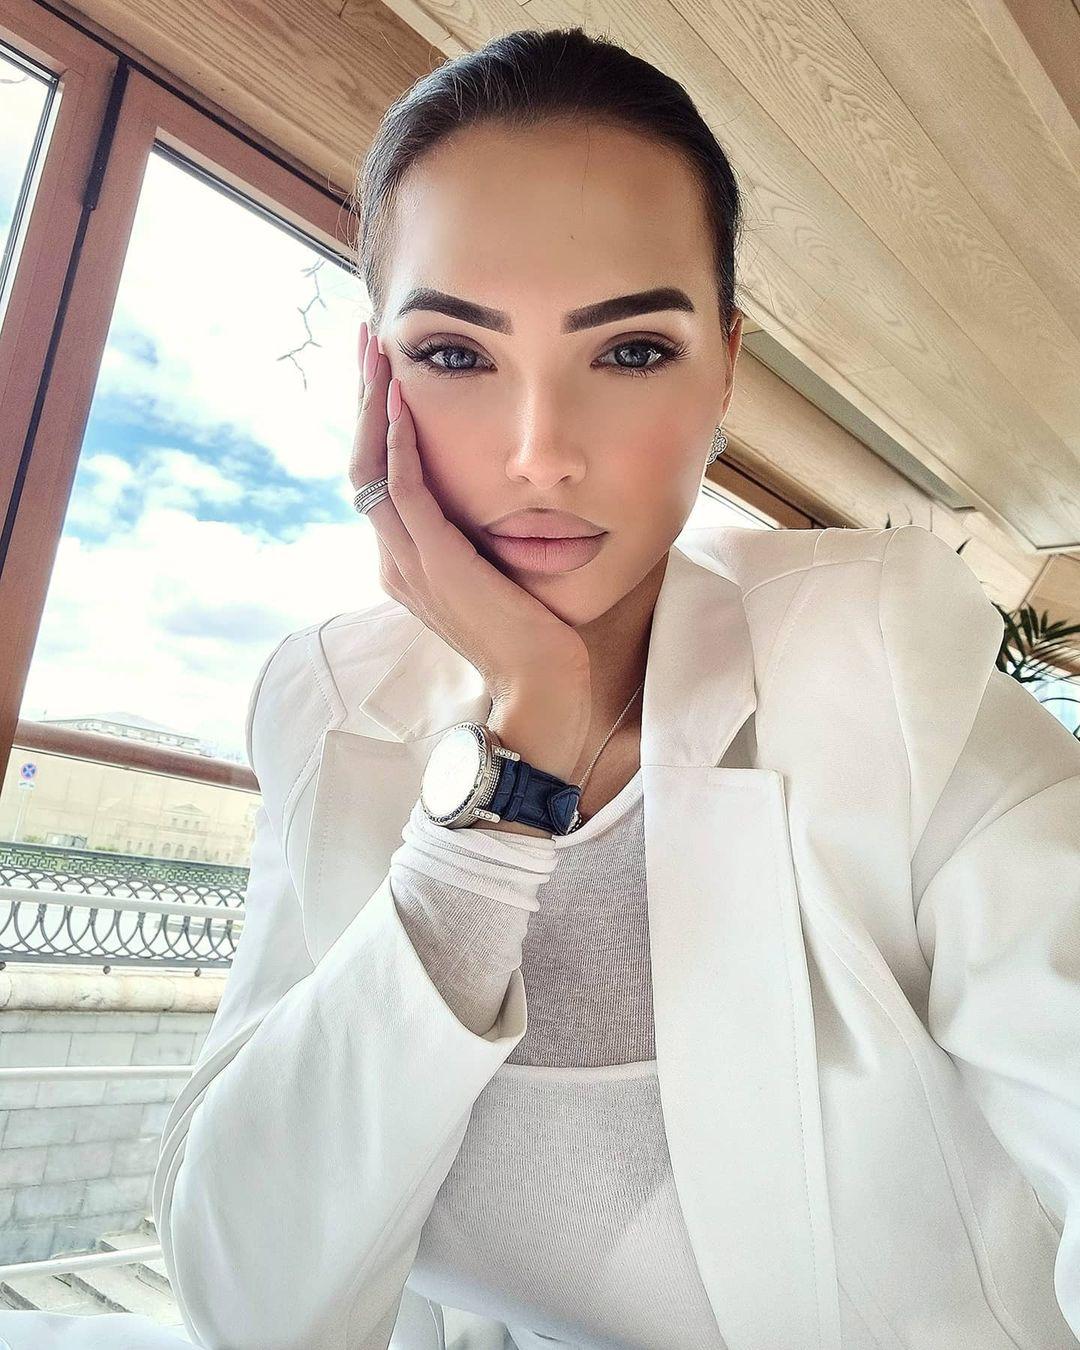 Elizaveta-Berejnaya-Wallpapers-Insta-Fit-Bio-Miss-elizabeth-sol-Wallpapers-Insta-Fit-Bio-15